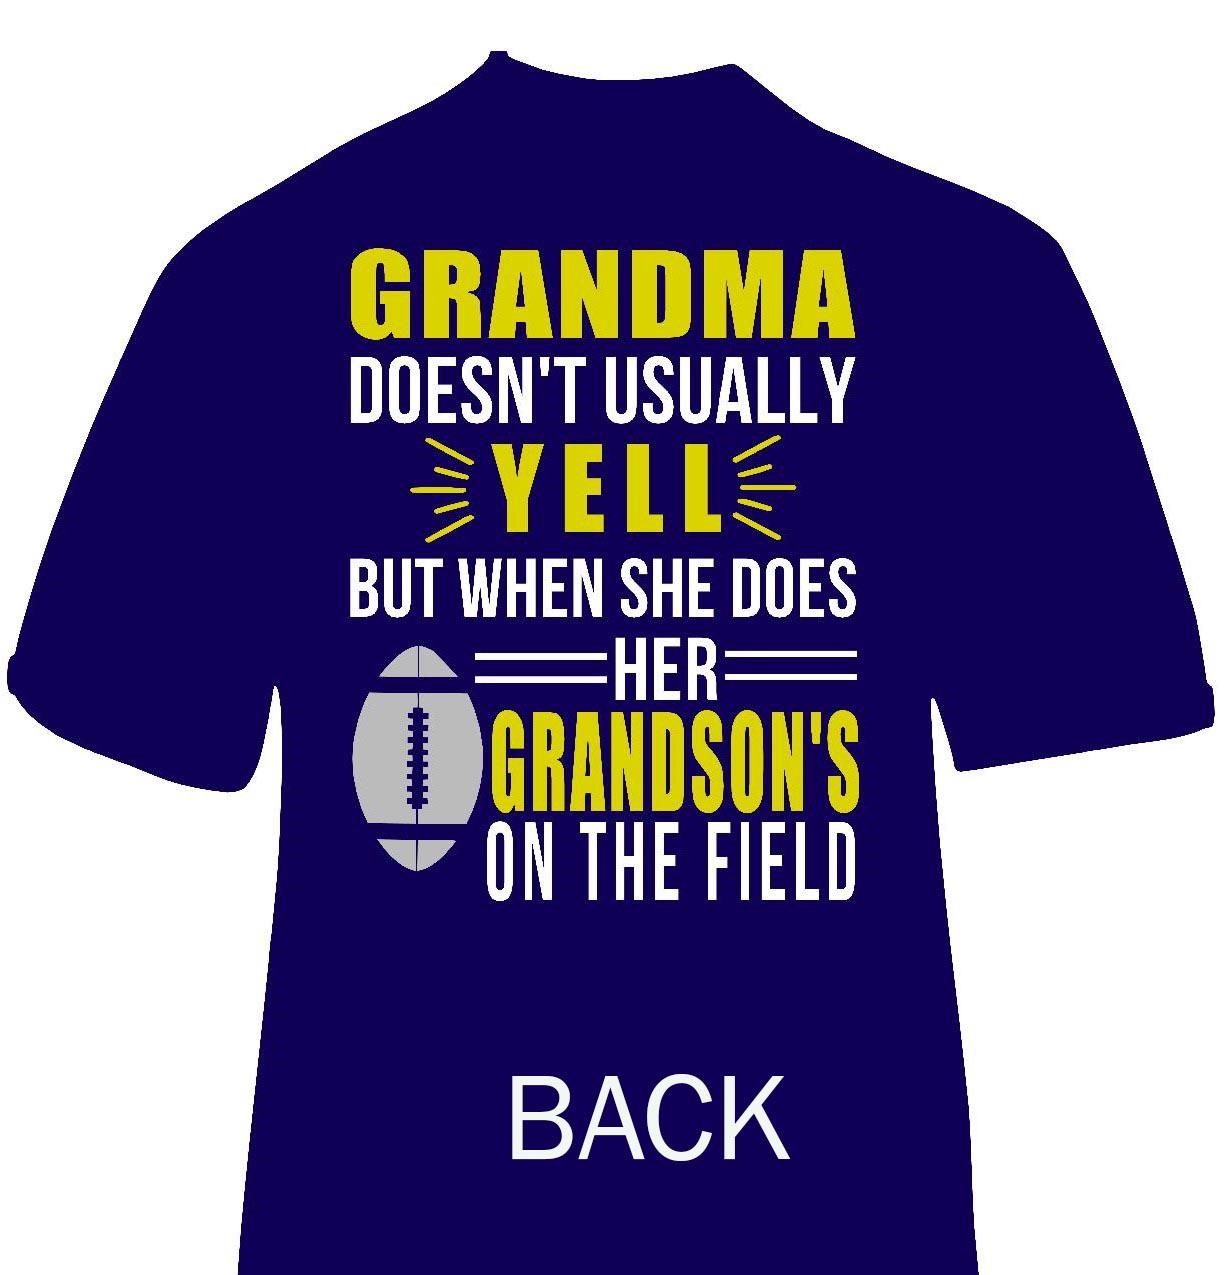 grandma doesnt usually yell.jpg